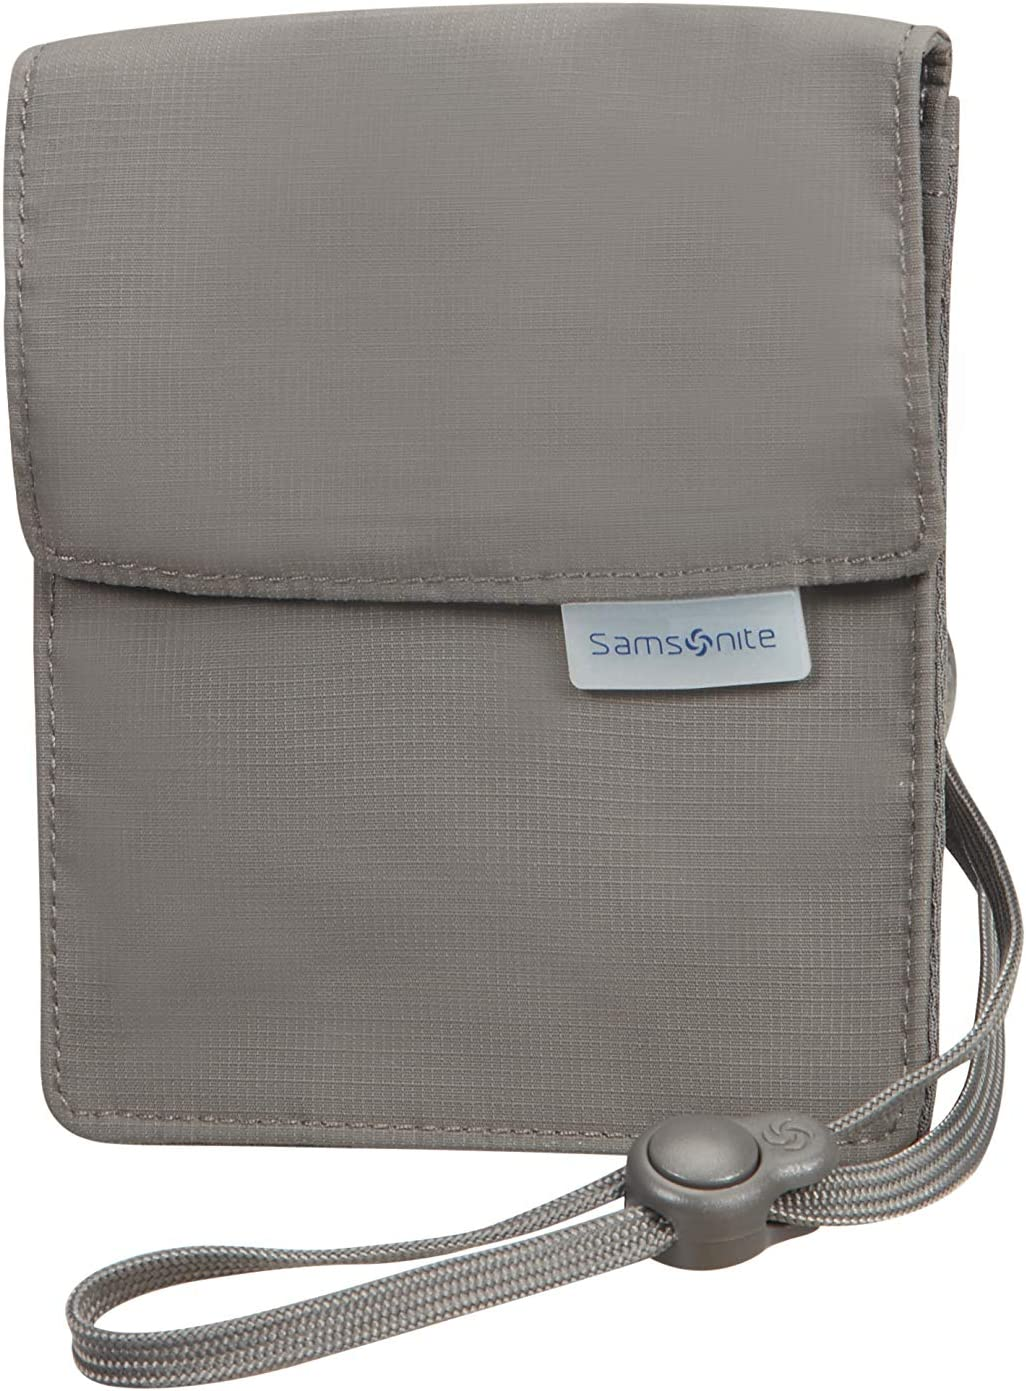 Beige Samsonite Global Travel Accessories Pochette Tour de Cou RFID 14 cm